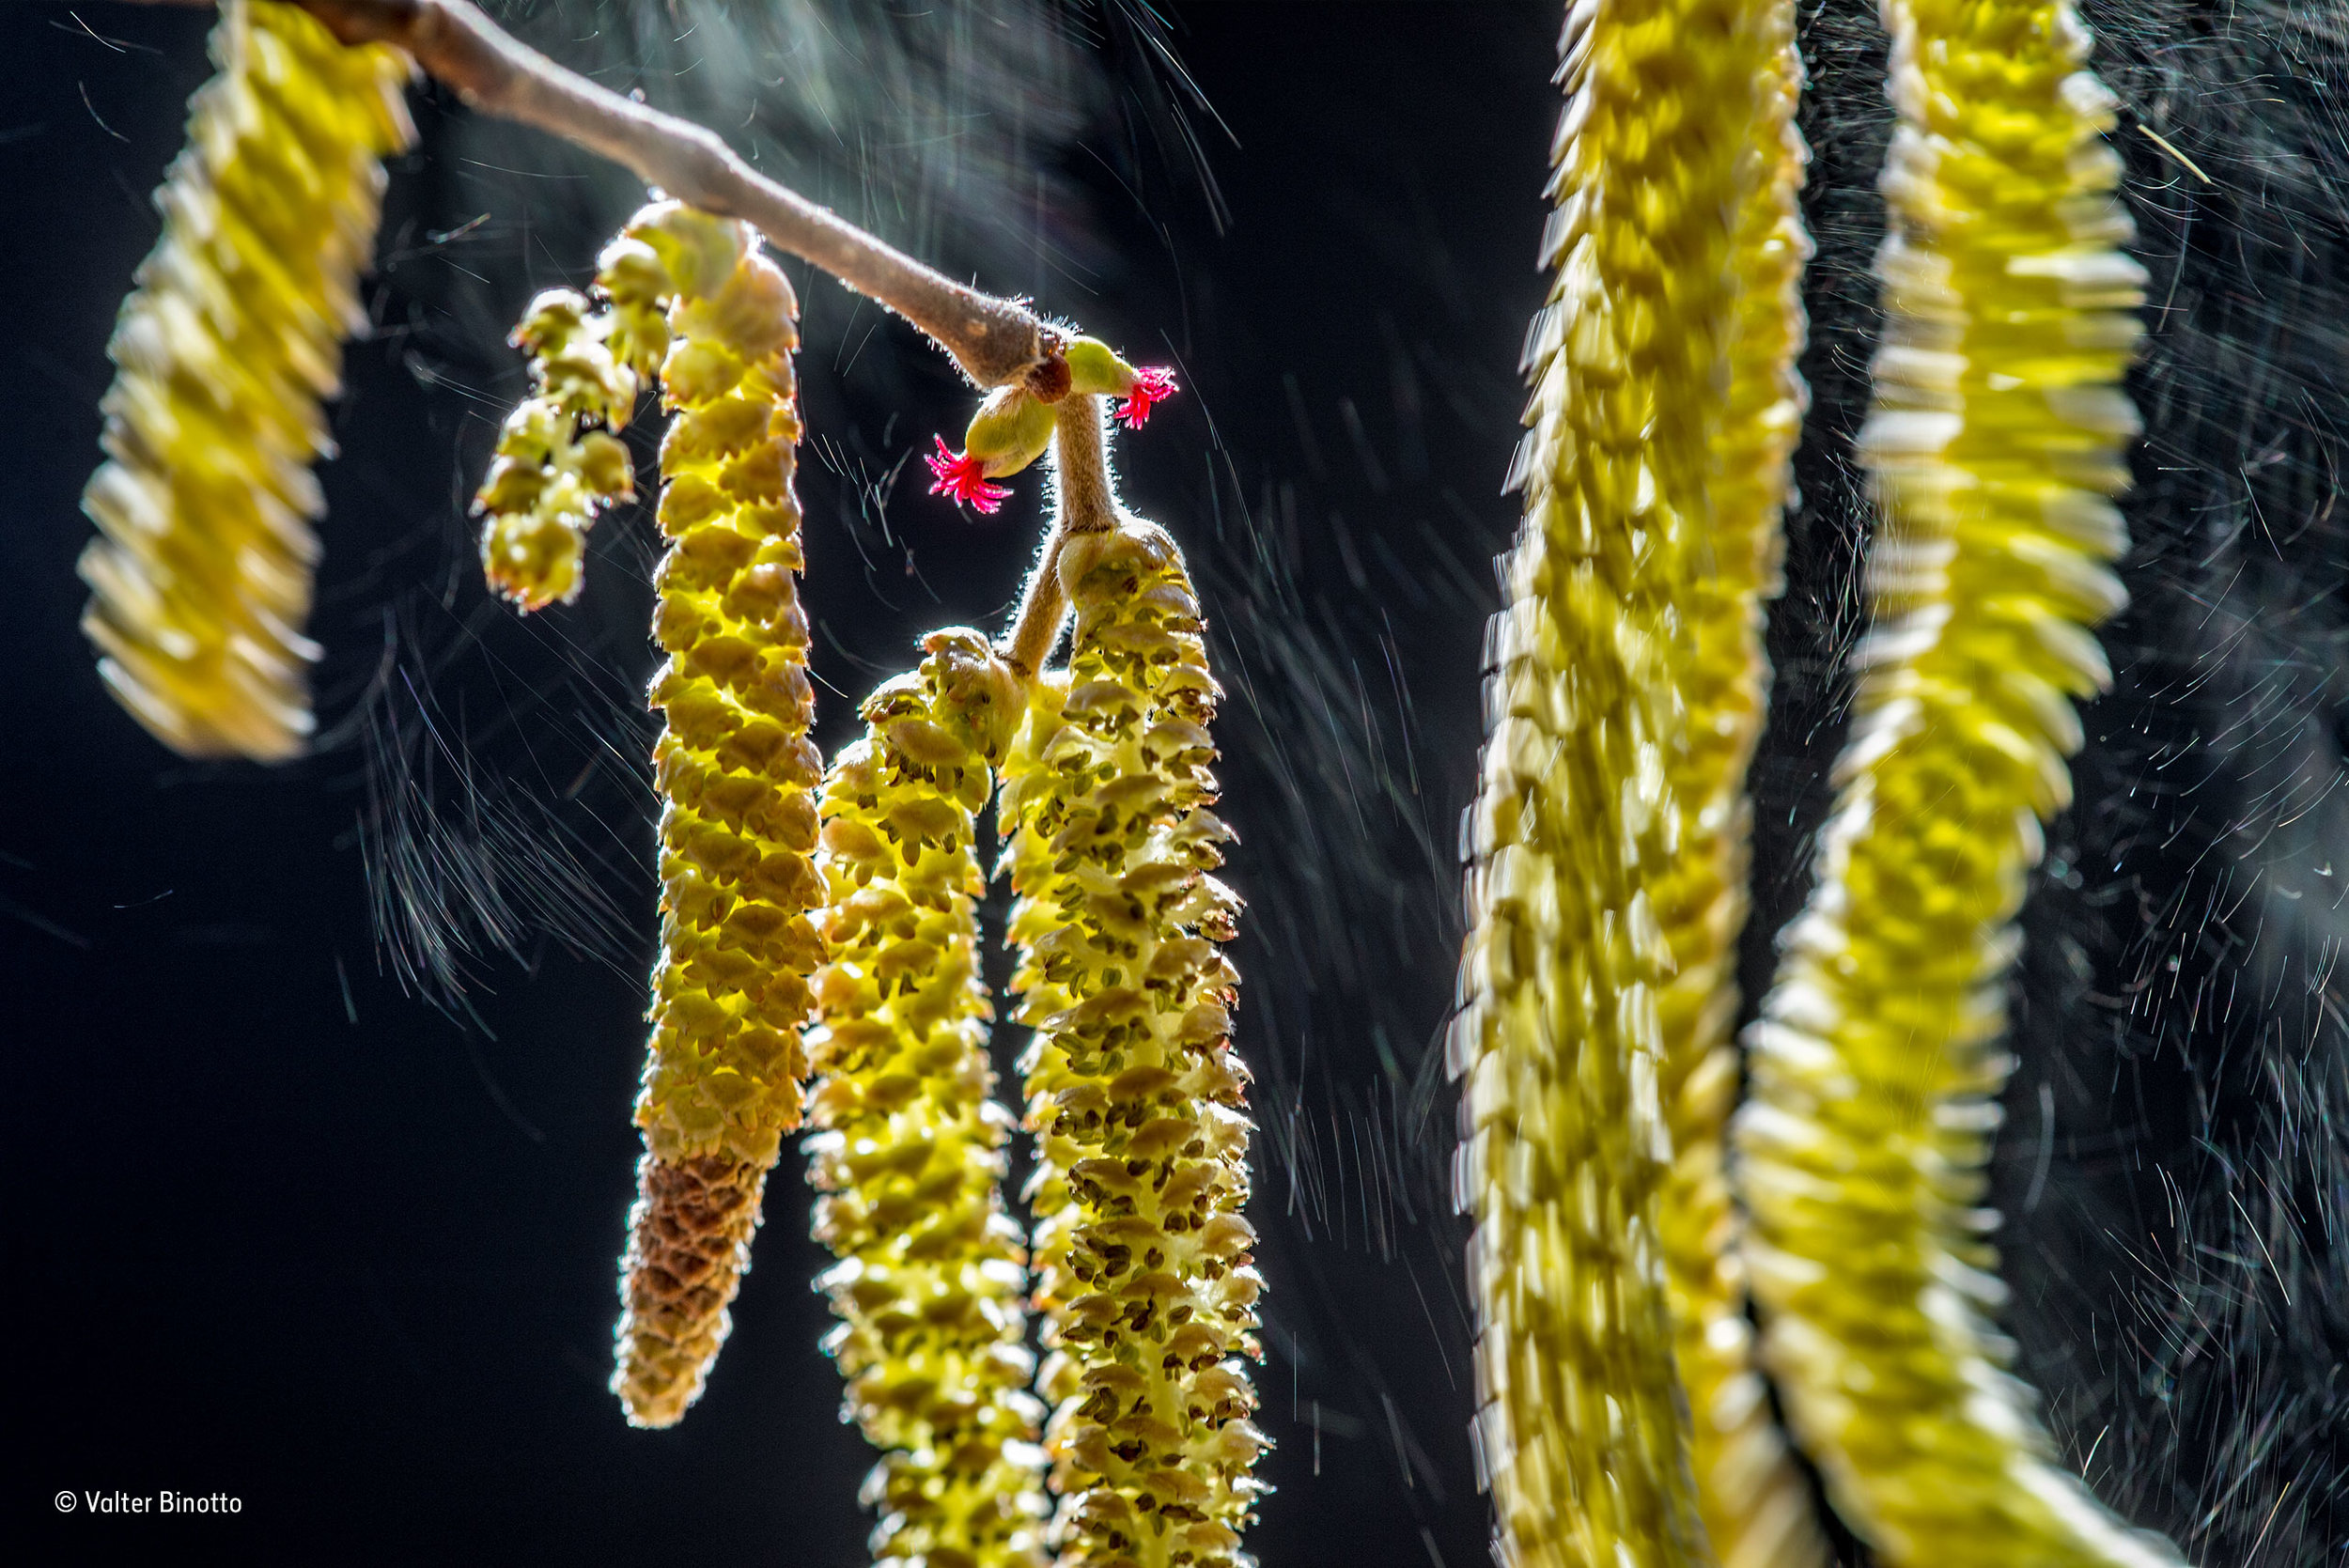 © Valter Binotto_Wildlife Photographer of the Year_ Plants winner